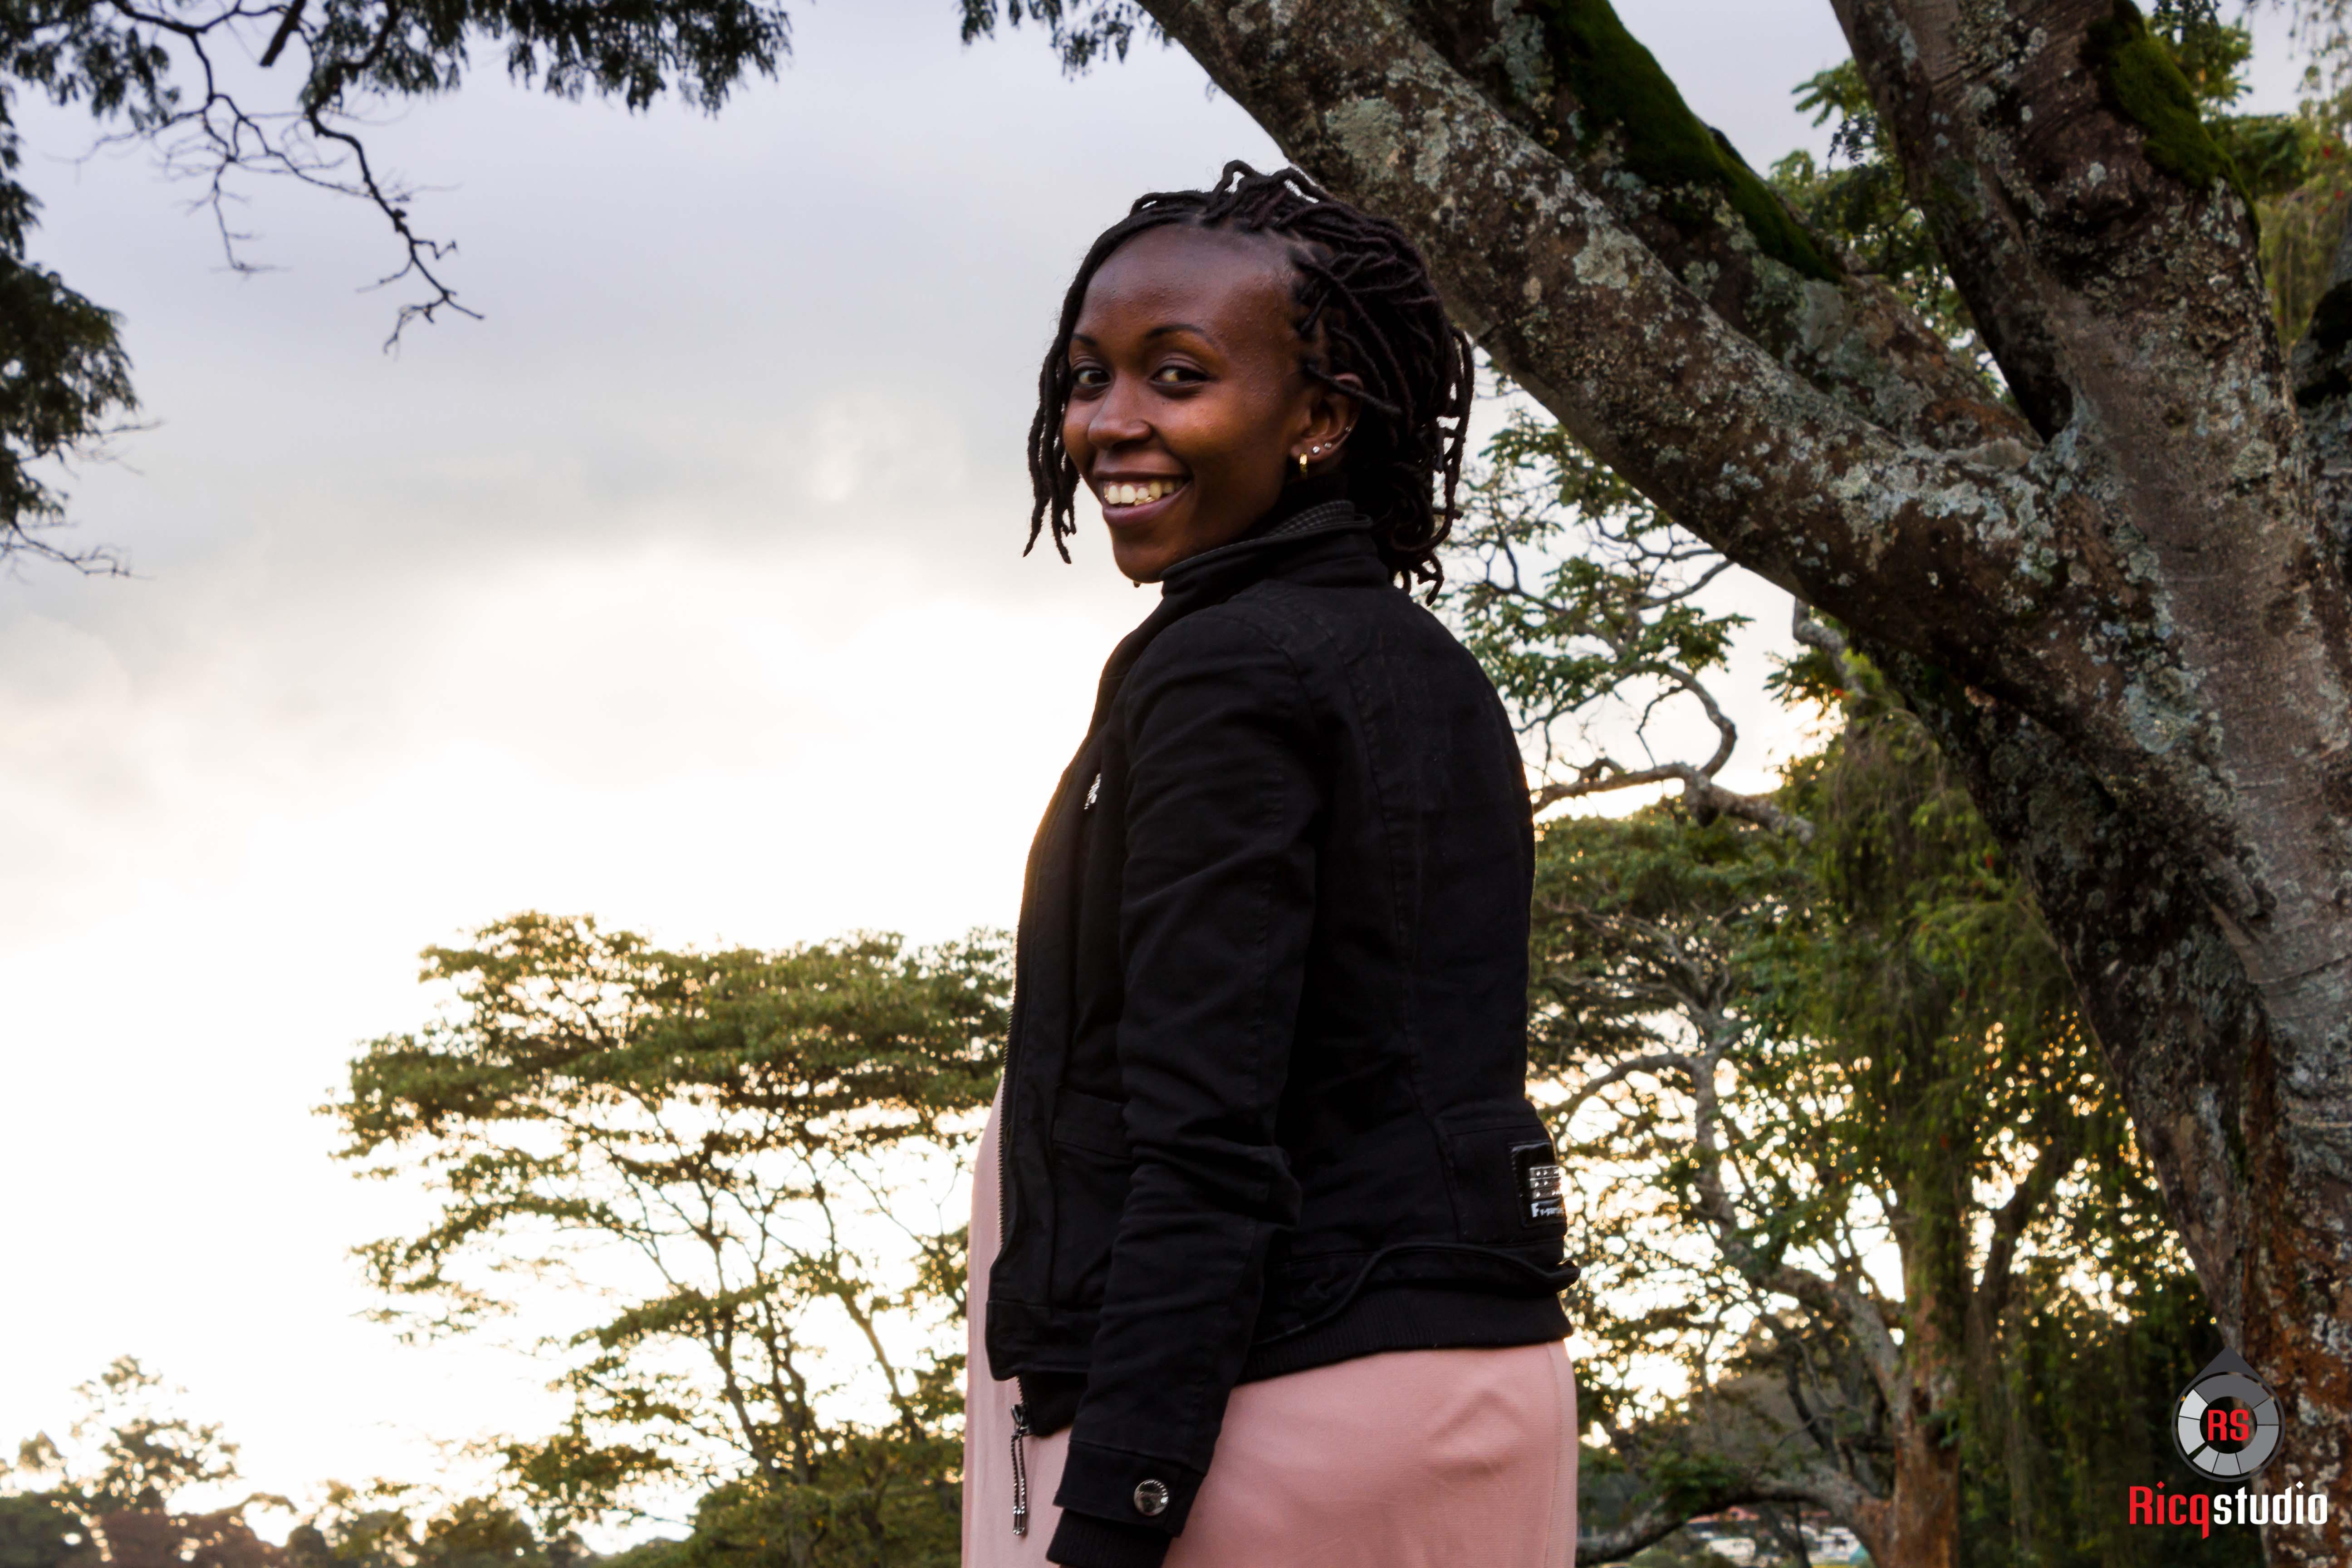 wedding photographer_ engagement in Kenya_ricqstudio-101